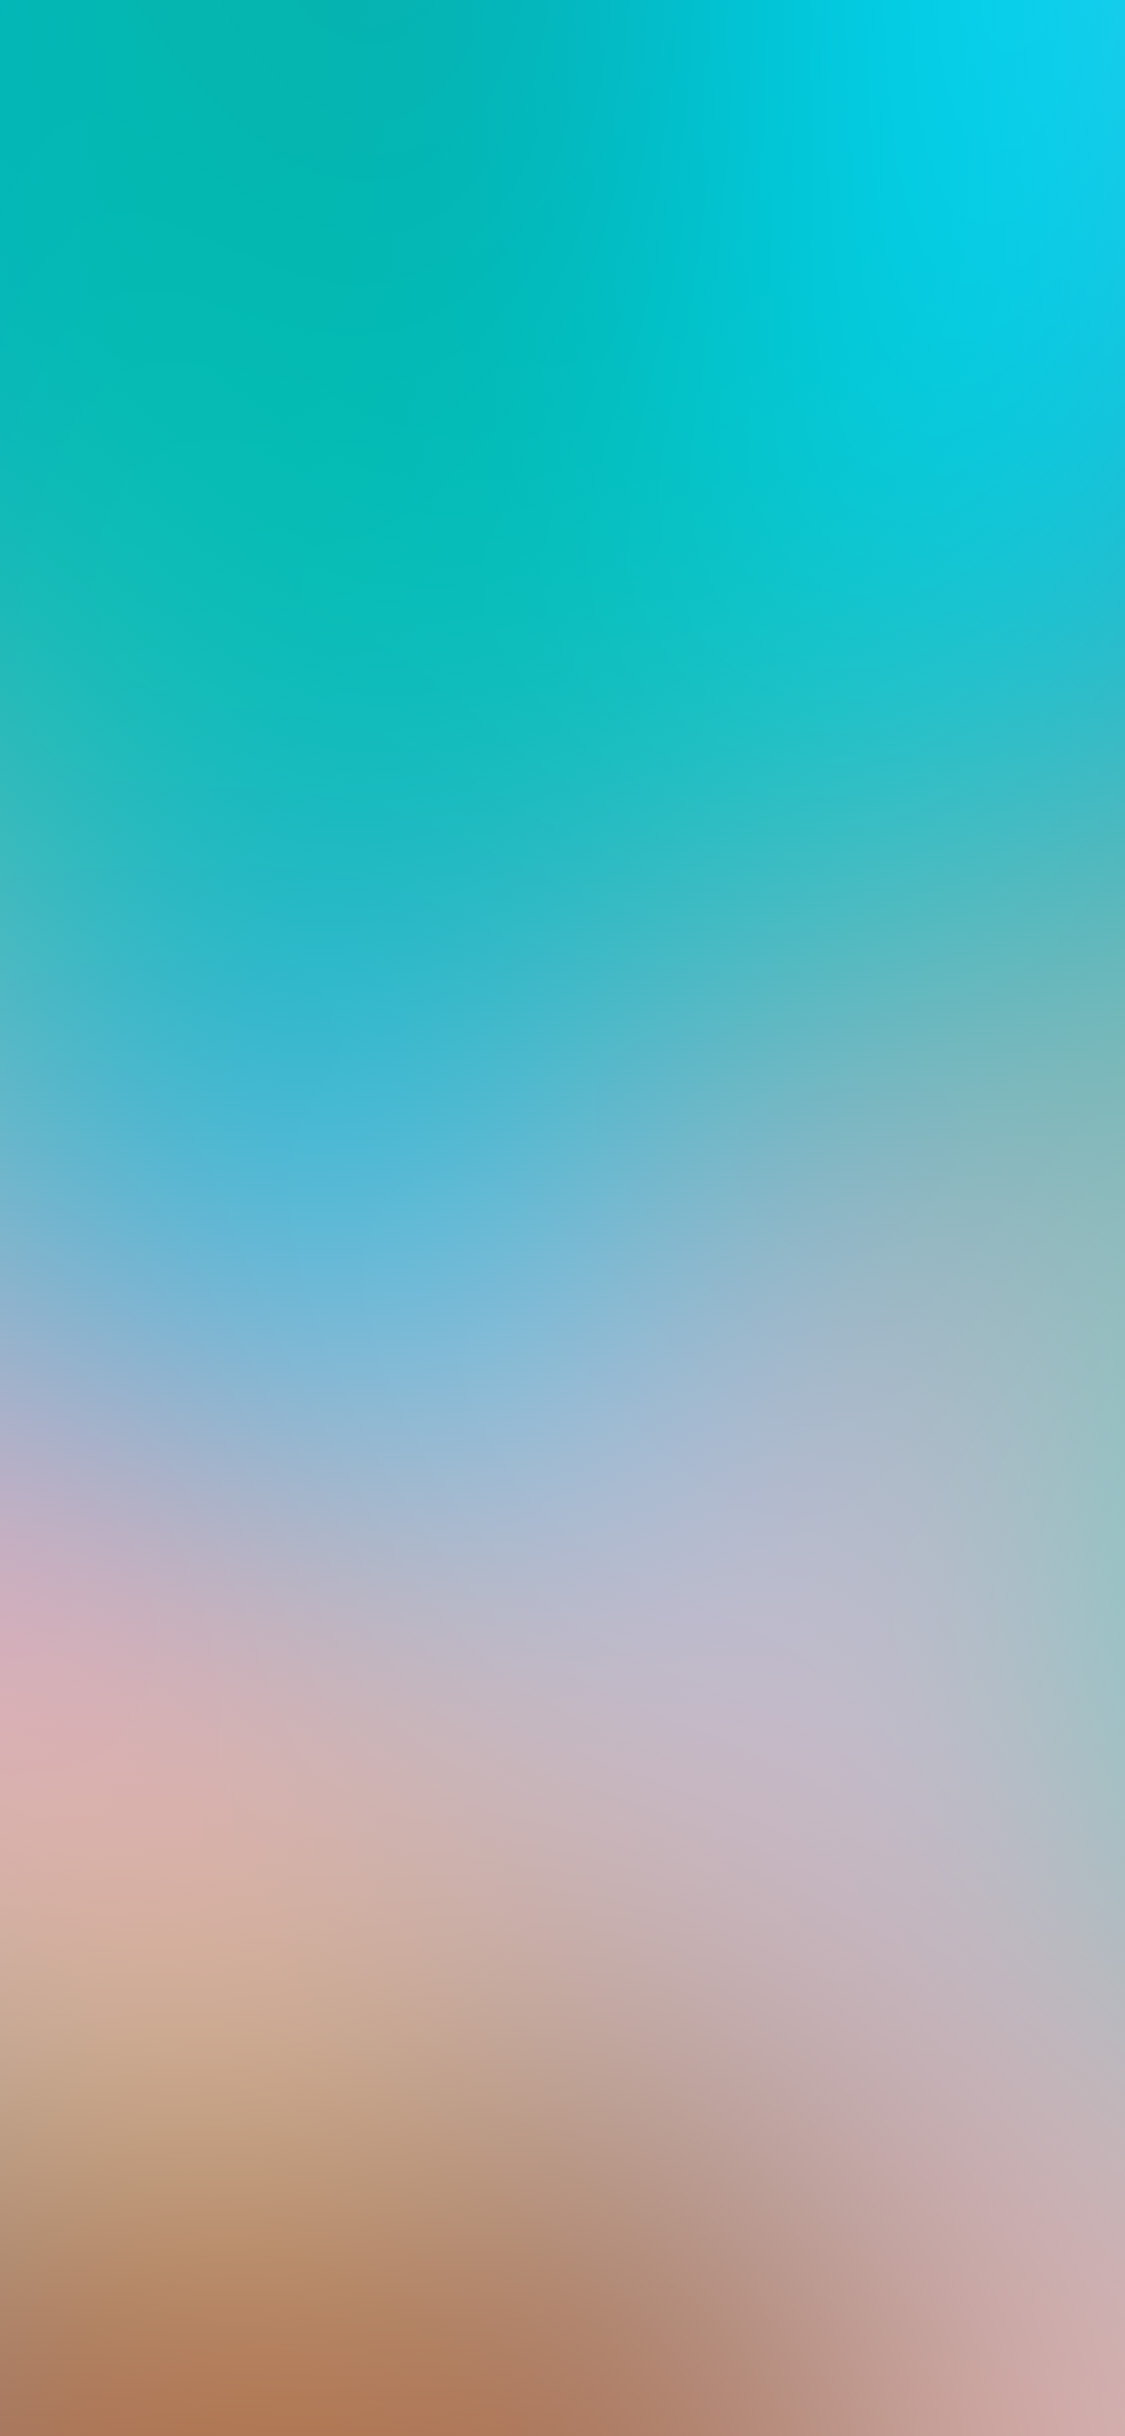 iPhonexpapers.com-Apple-iPhone-wallpaper-so00-pastel-green-blue-blur-gradation